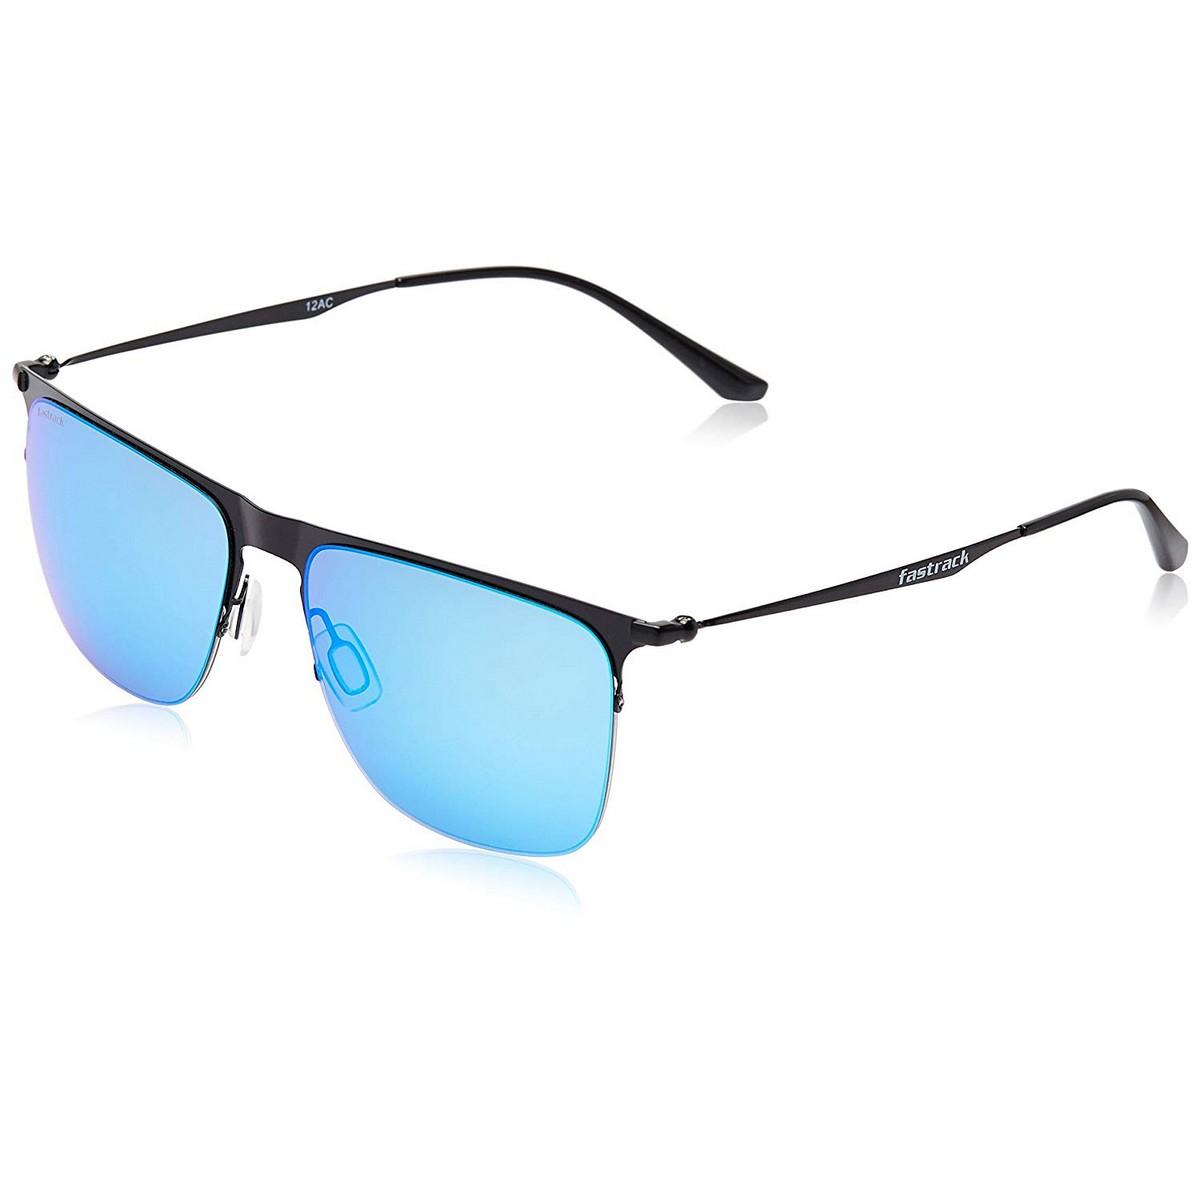 Fastrack Blue Clubmaster Sunglasses M145BU3